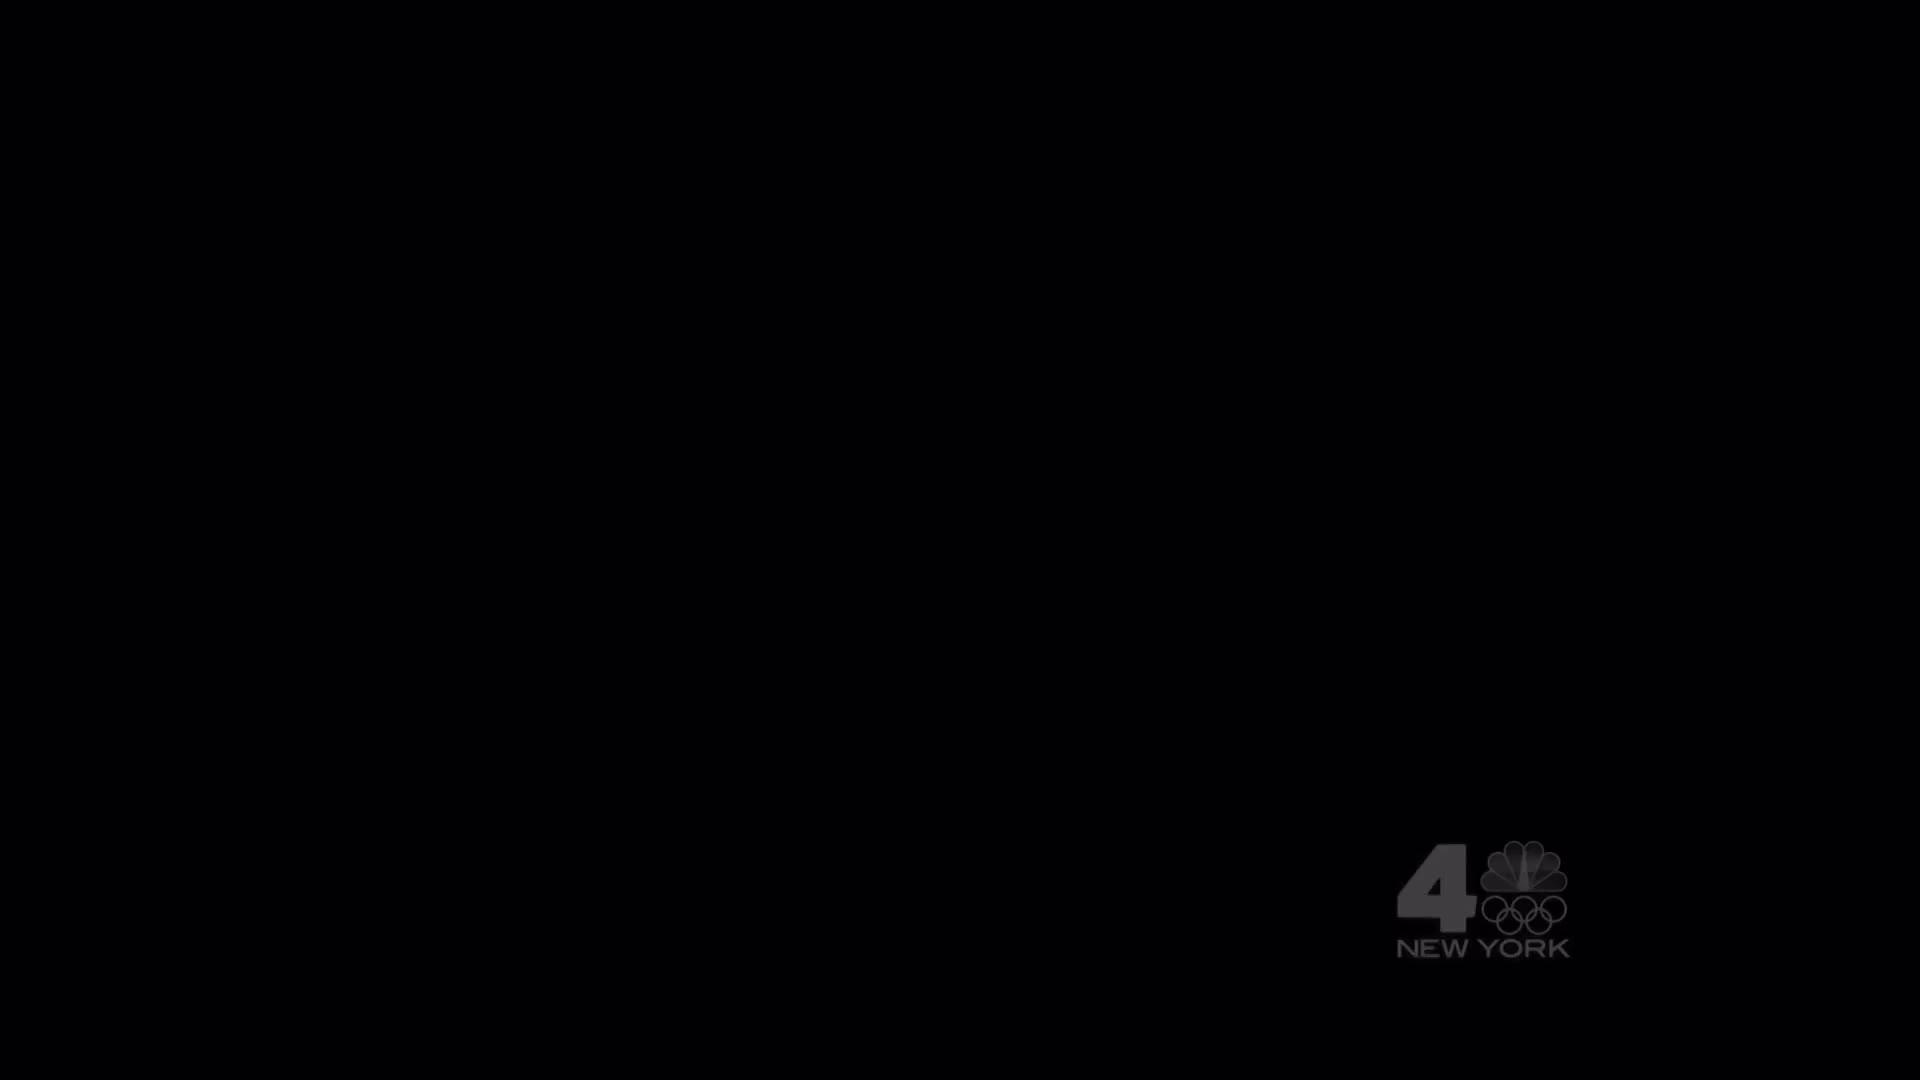 Ashley Bellman, Darlene Rodriguez, Joelle Garguilo, Lauren Scala, Lilliana Vazquez, MILF, NBC, NY Rangers, NYC, Natalie Morales, Natalie Pasquarella, Natmo, New York Live, News, Raina Seitel, The Today Show, Traffic, WNBC, booty, weather report, Giada De Laurentiis cleavage! (09 14 2017) GIFs